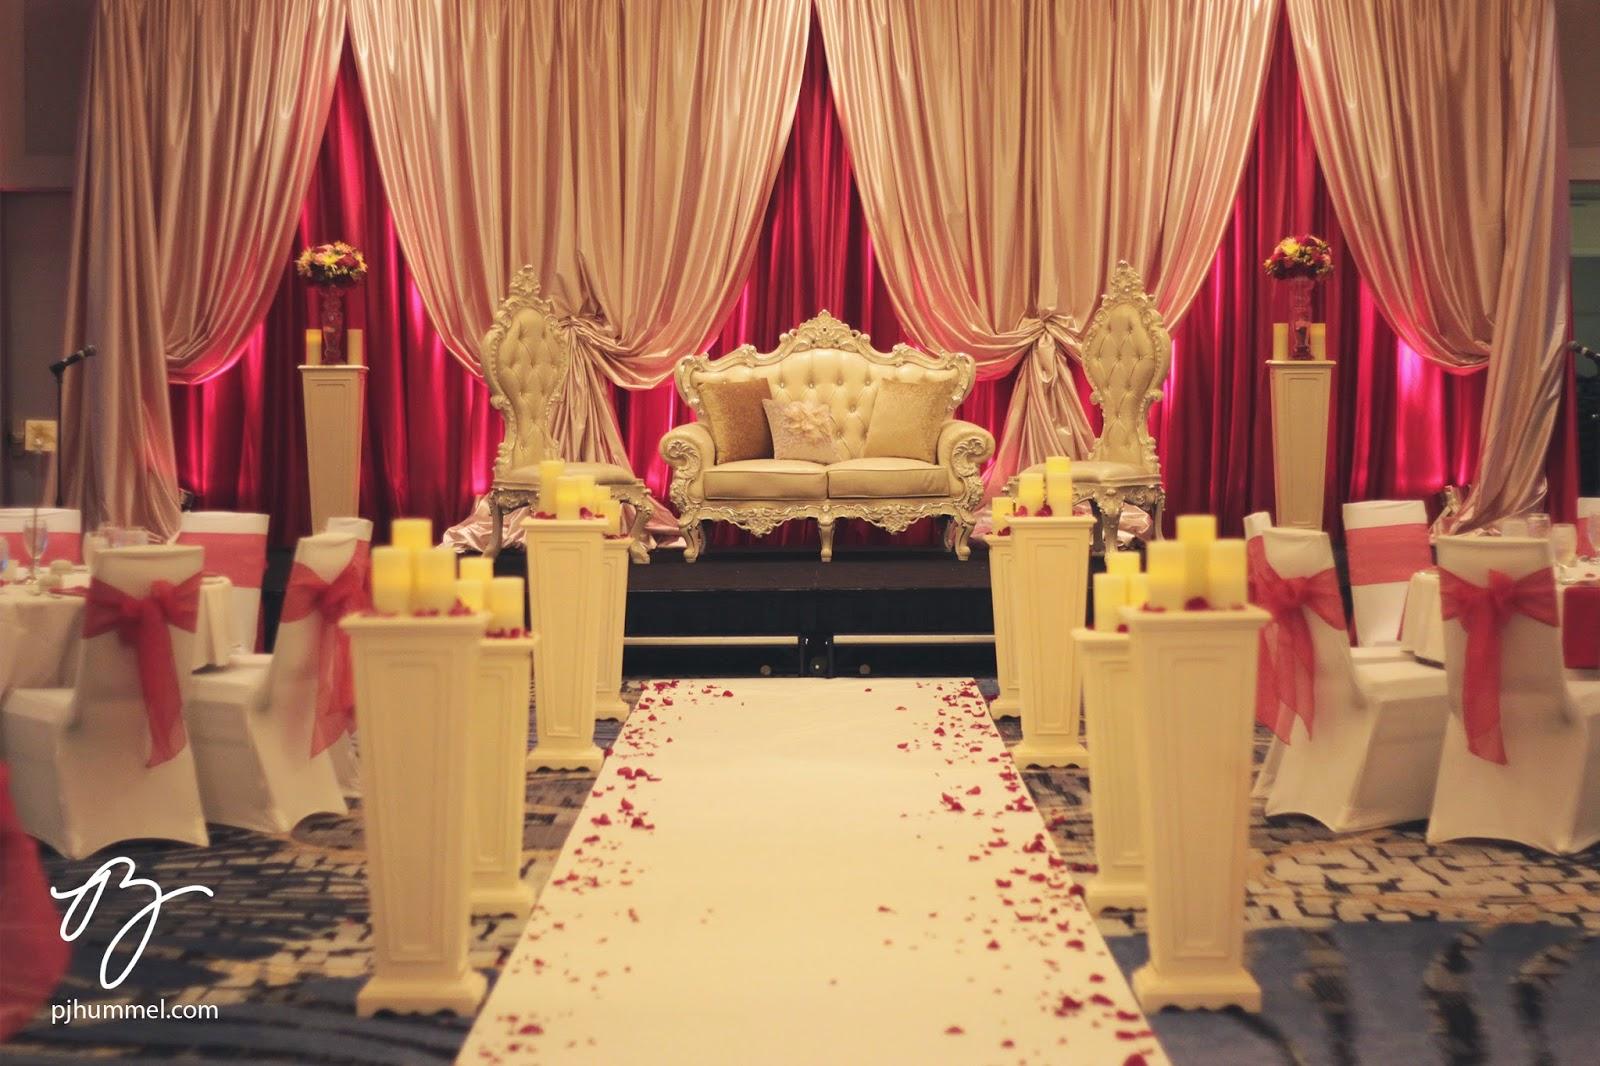 Pj Hummel And Company Inc Champagne Scarlet Shaadi Wedding Reception